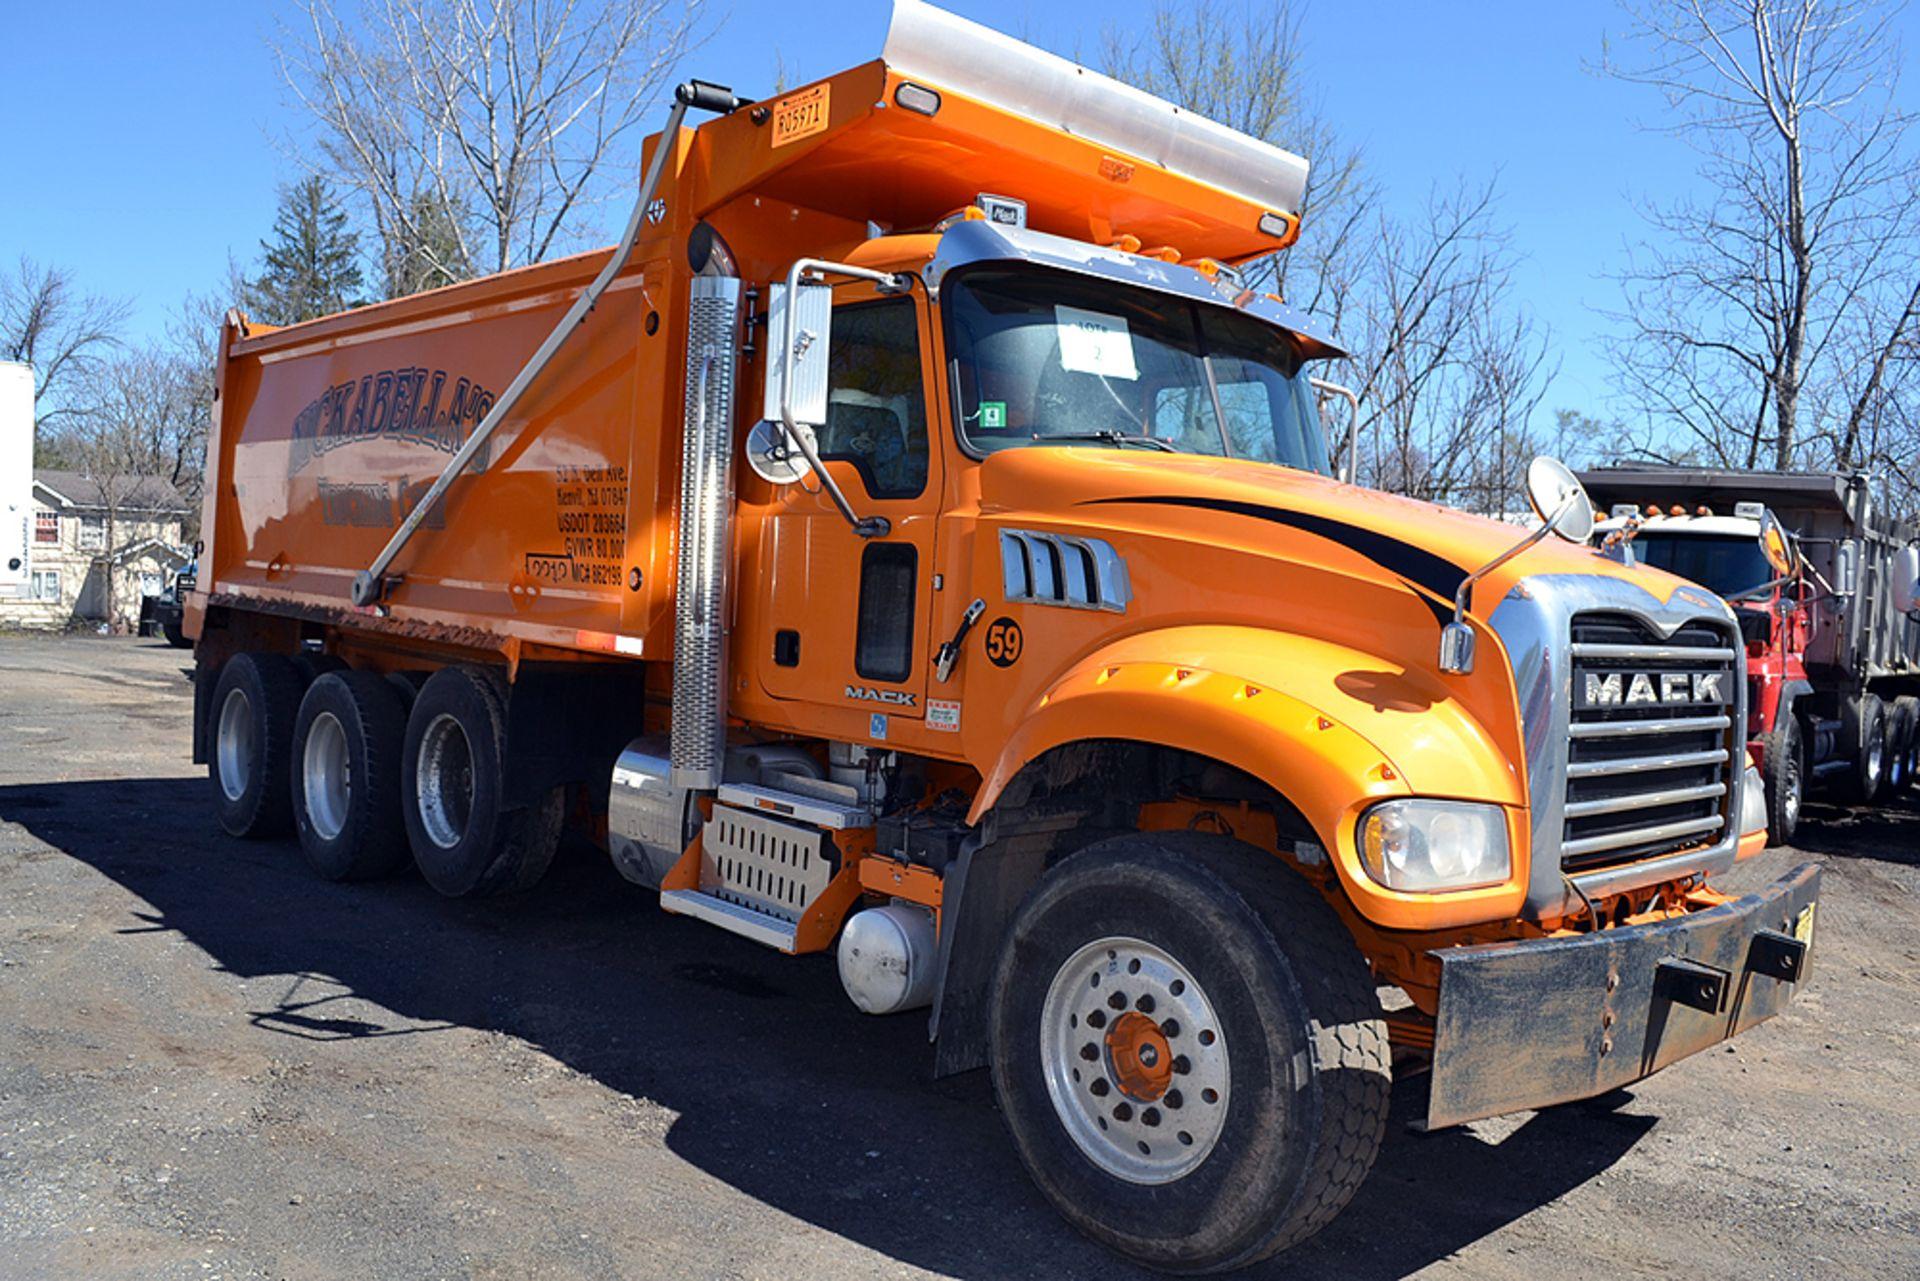 Lot 2 - 2017 Mack GU713 Standard Cab Tri-Axle, Dump Truck